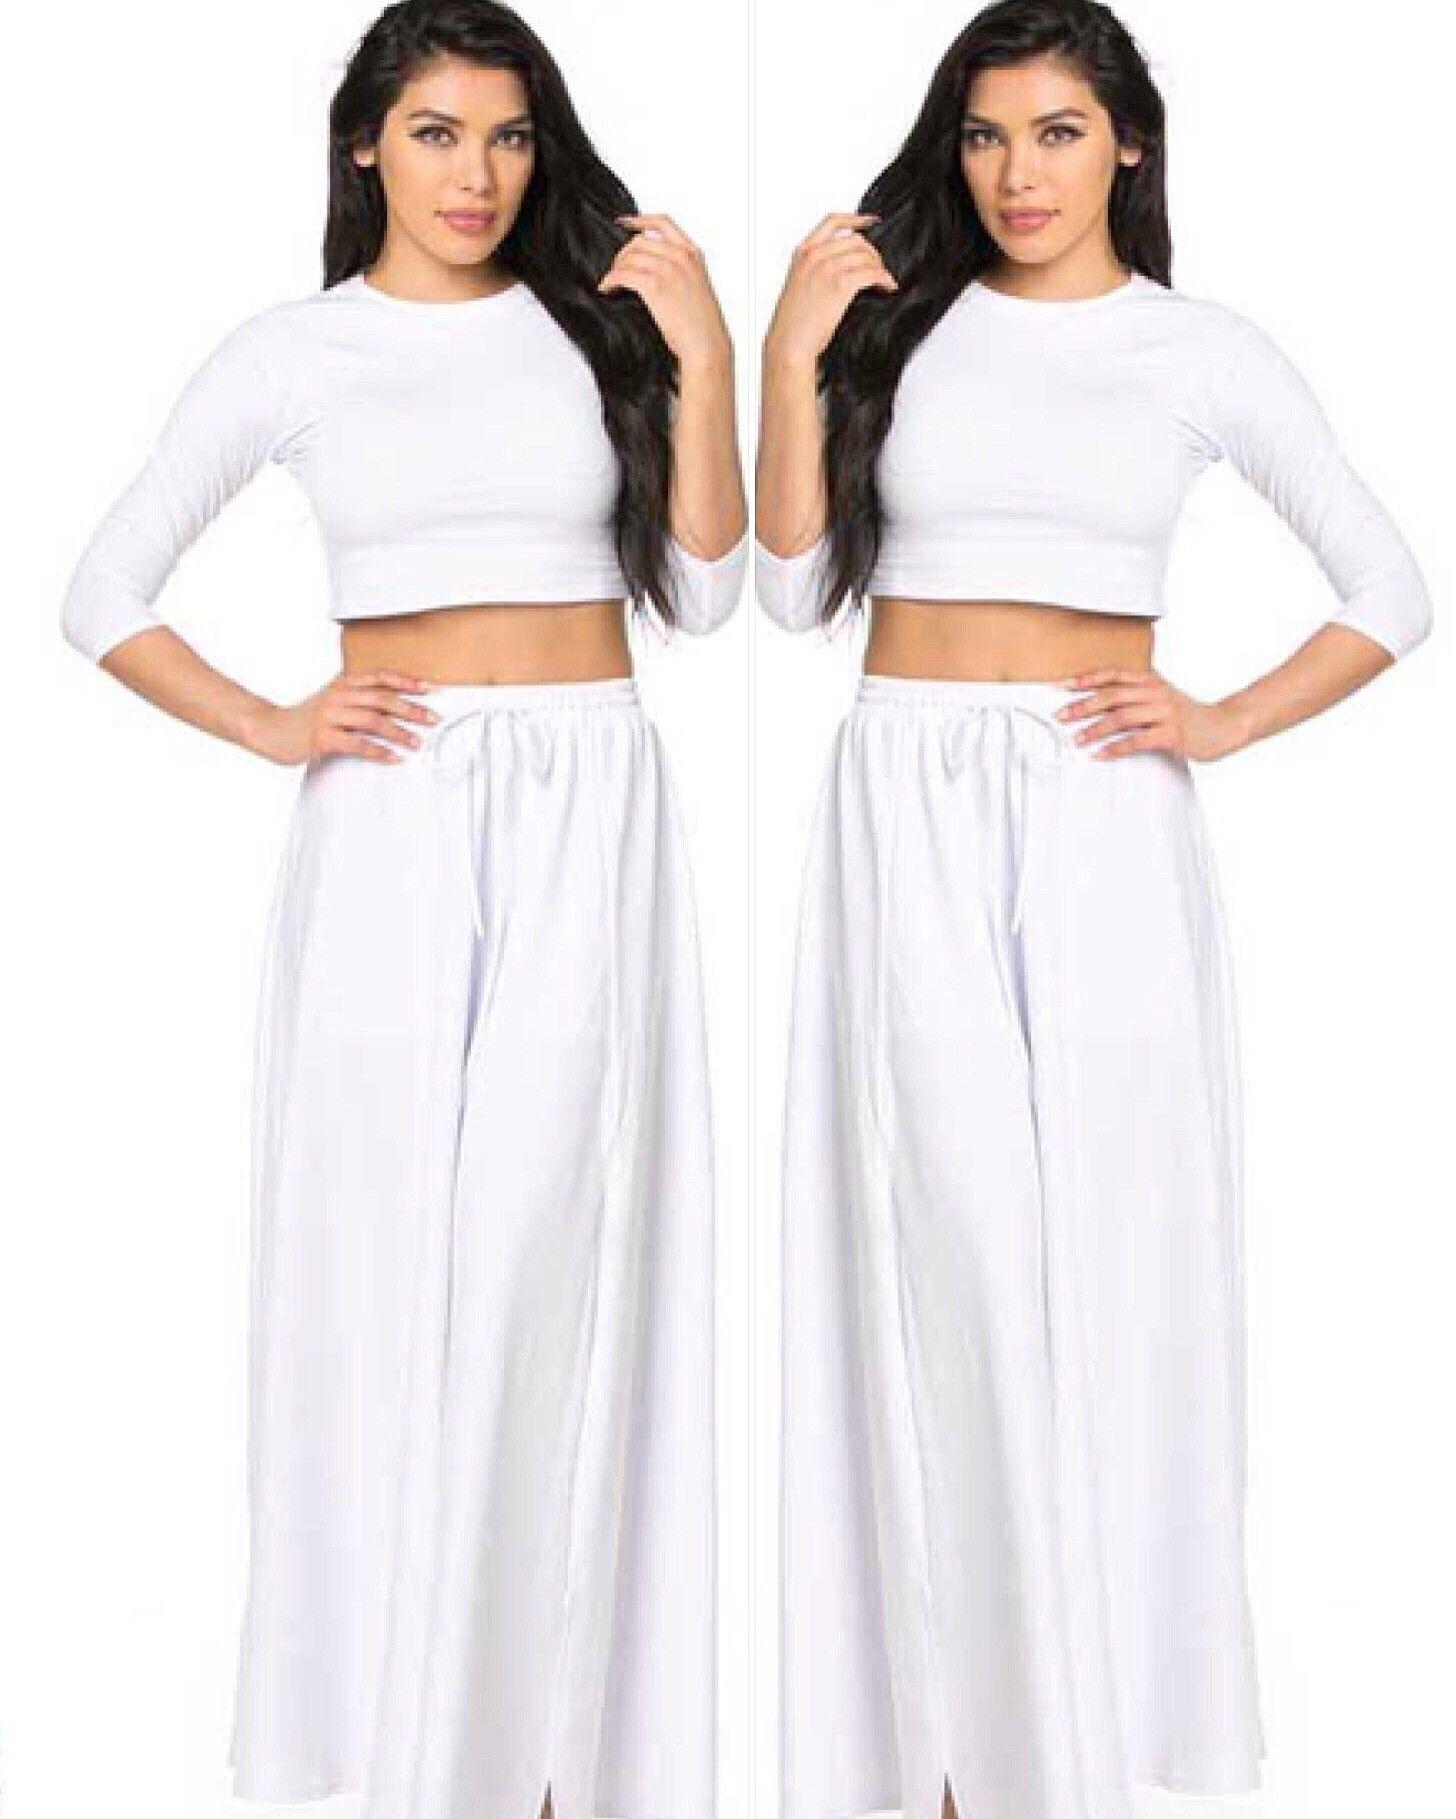 e608efd95 2 Piece Crop Top Sweat Maxi Skirt w/ Slit Set | Women's fashion ...